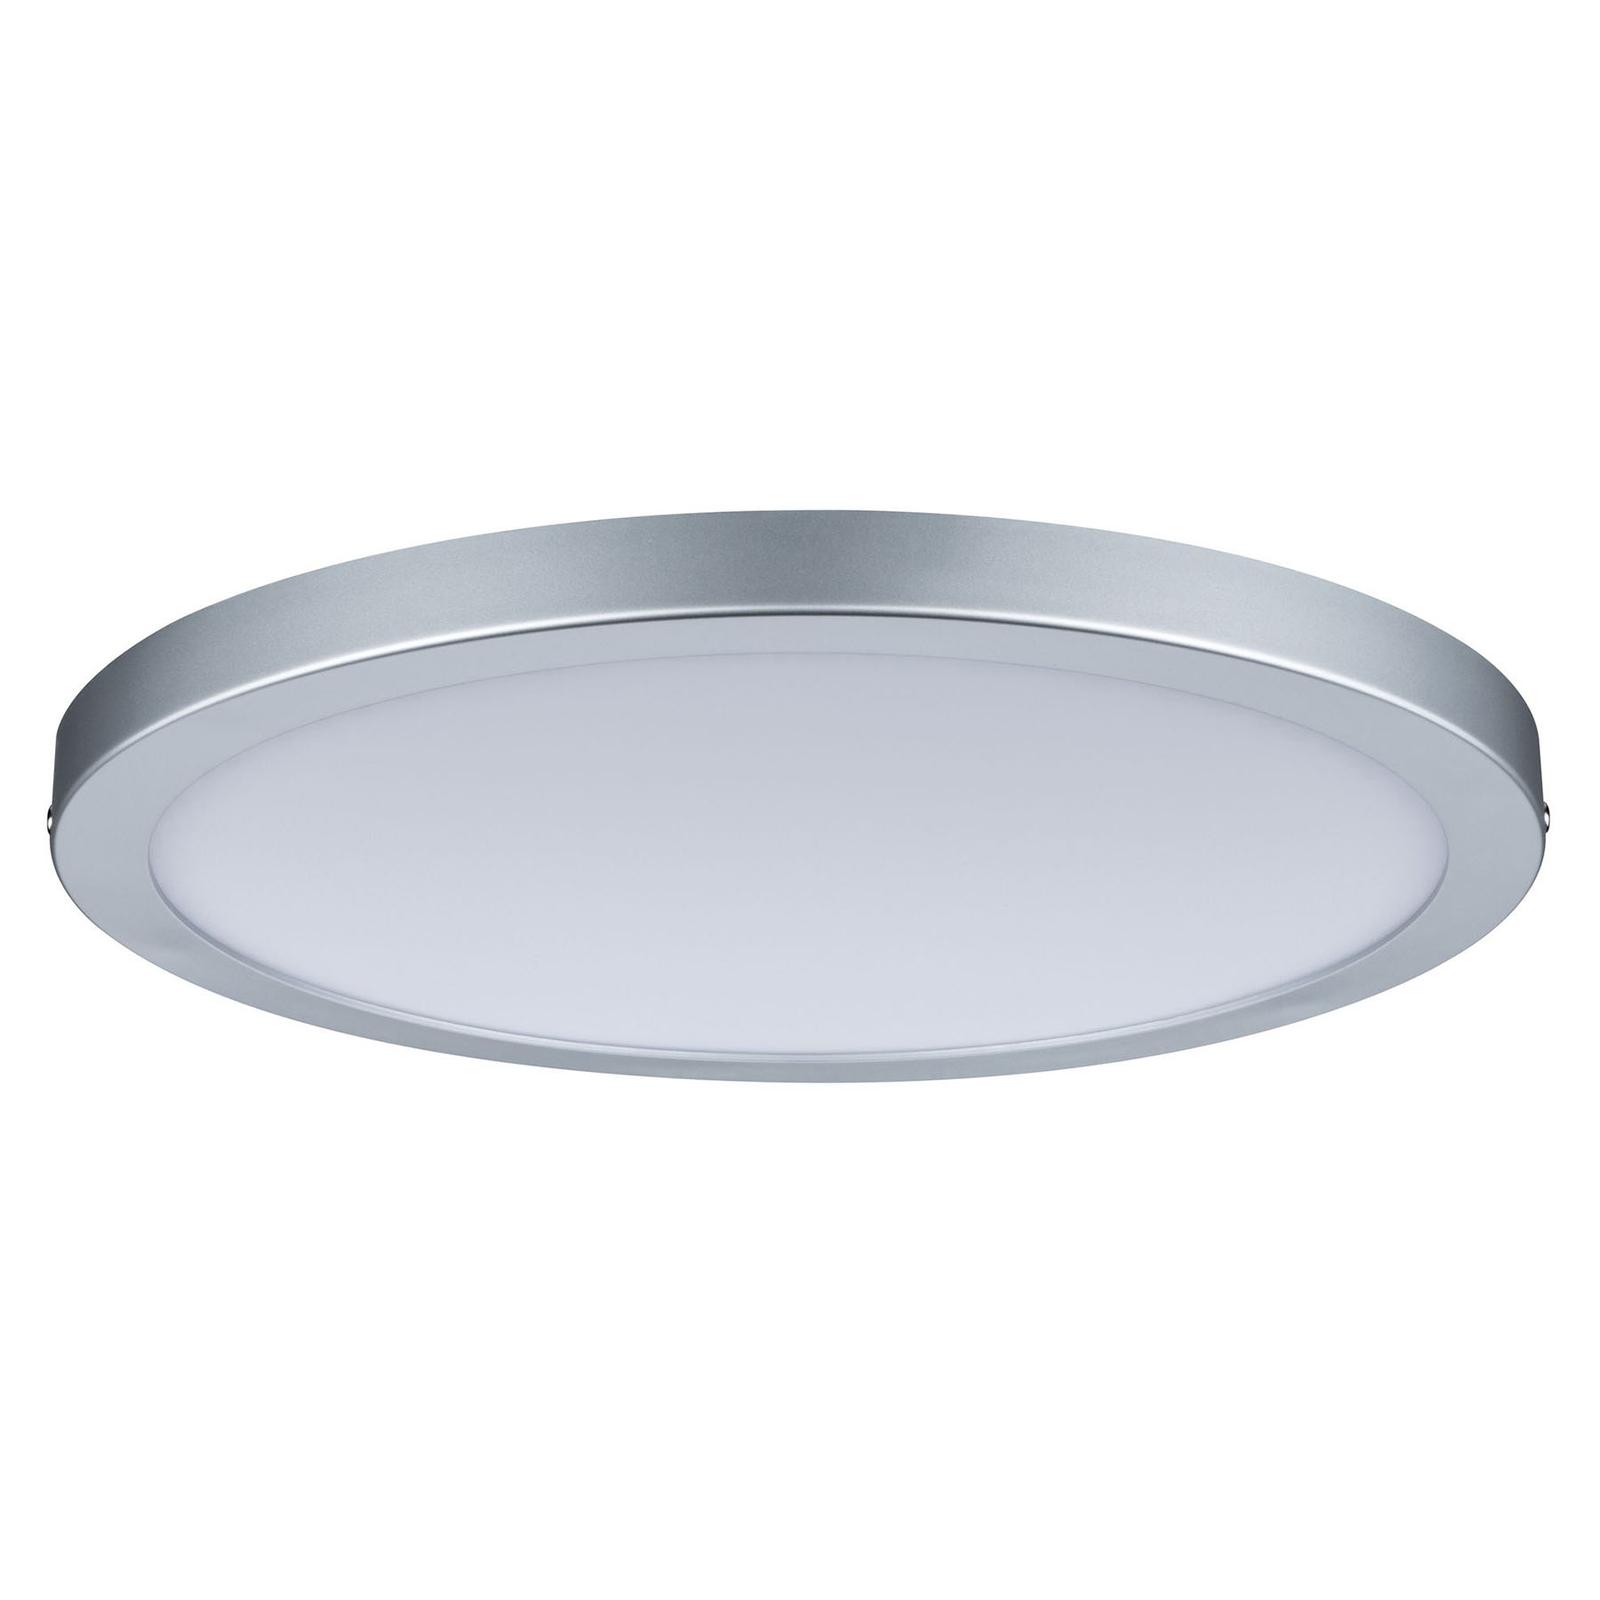 Paulmann Atria lampa sufitowa LED Ø30cm chrom